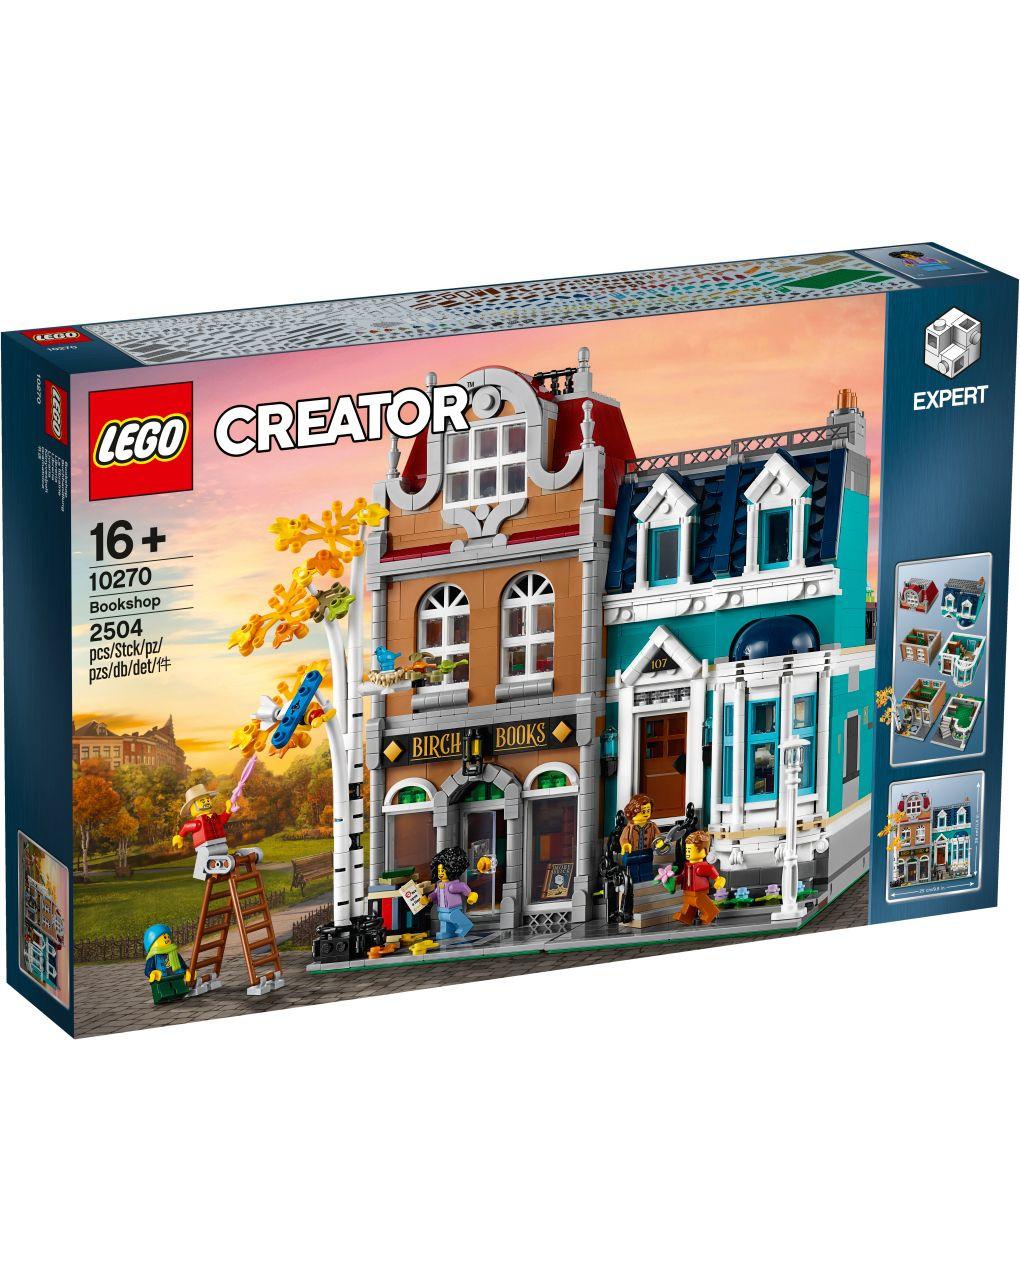 Lego creator expert - libreria - 10270 - LEGO